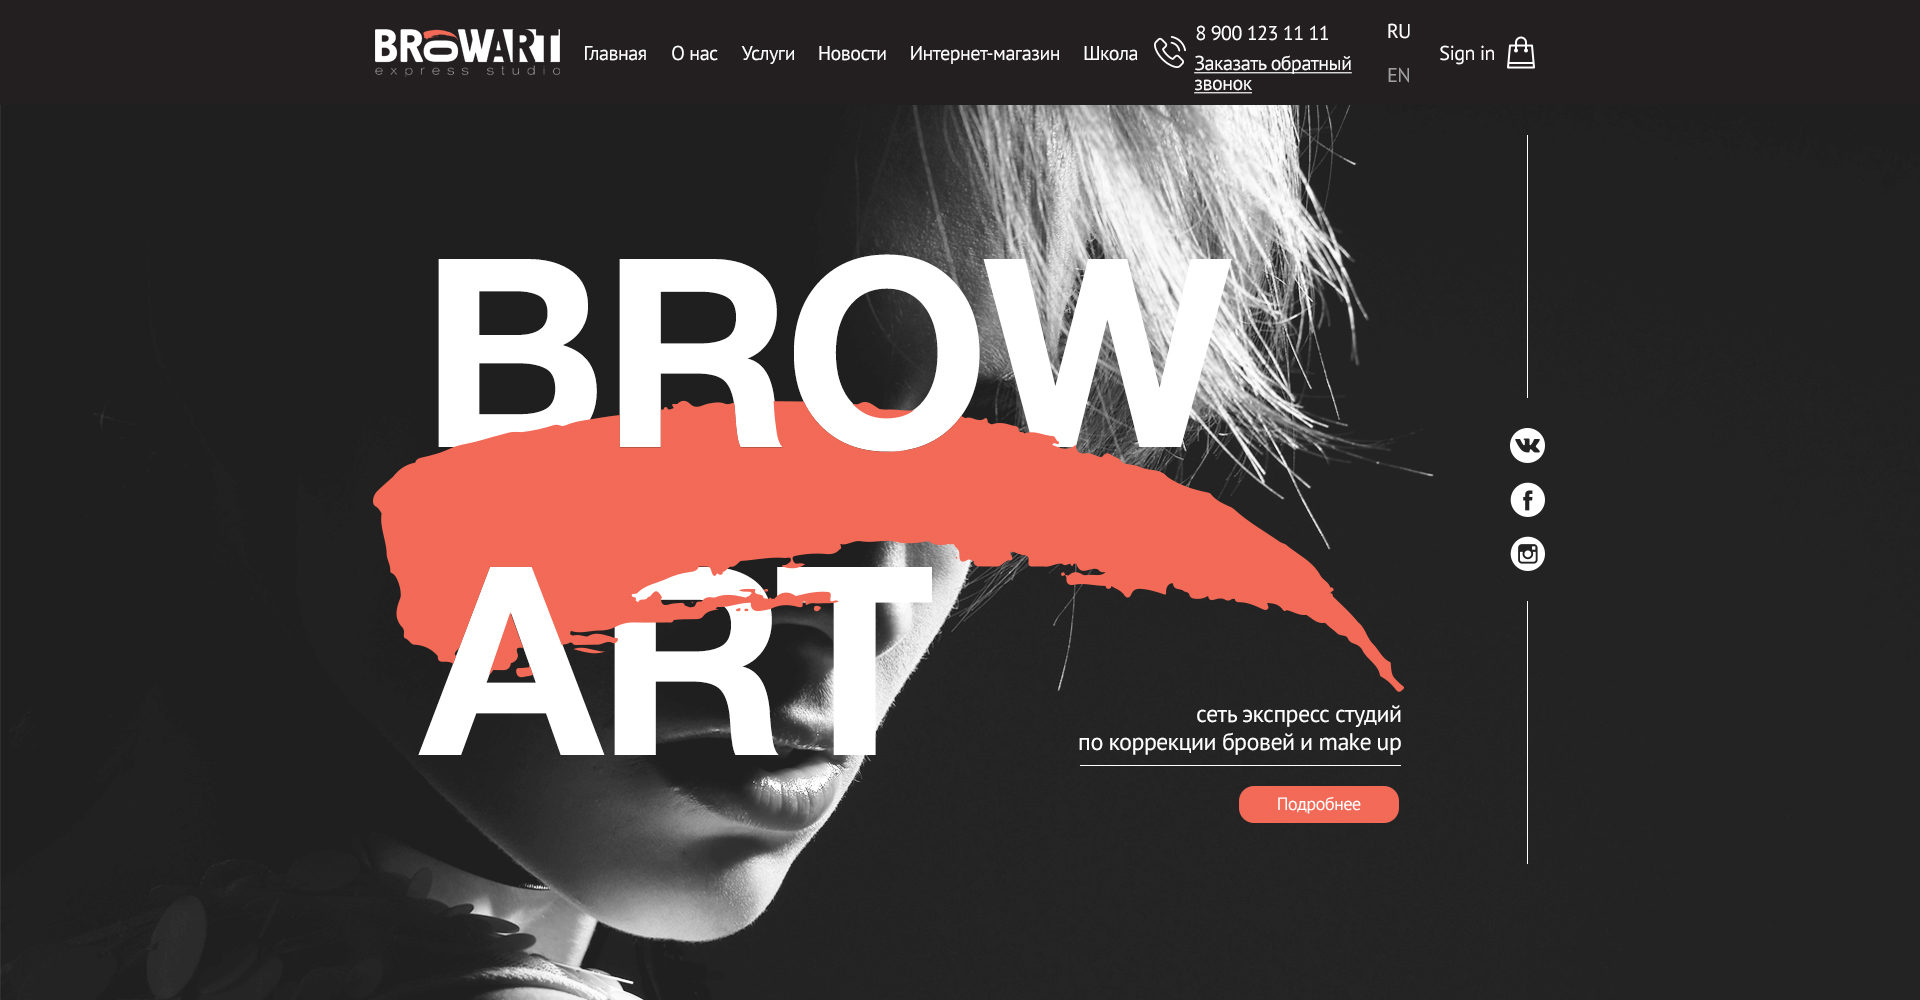 Дизайн сайта на основе готового прототипа-схемы и концепции фото f_2995a2464dfa2e46.jpg